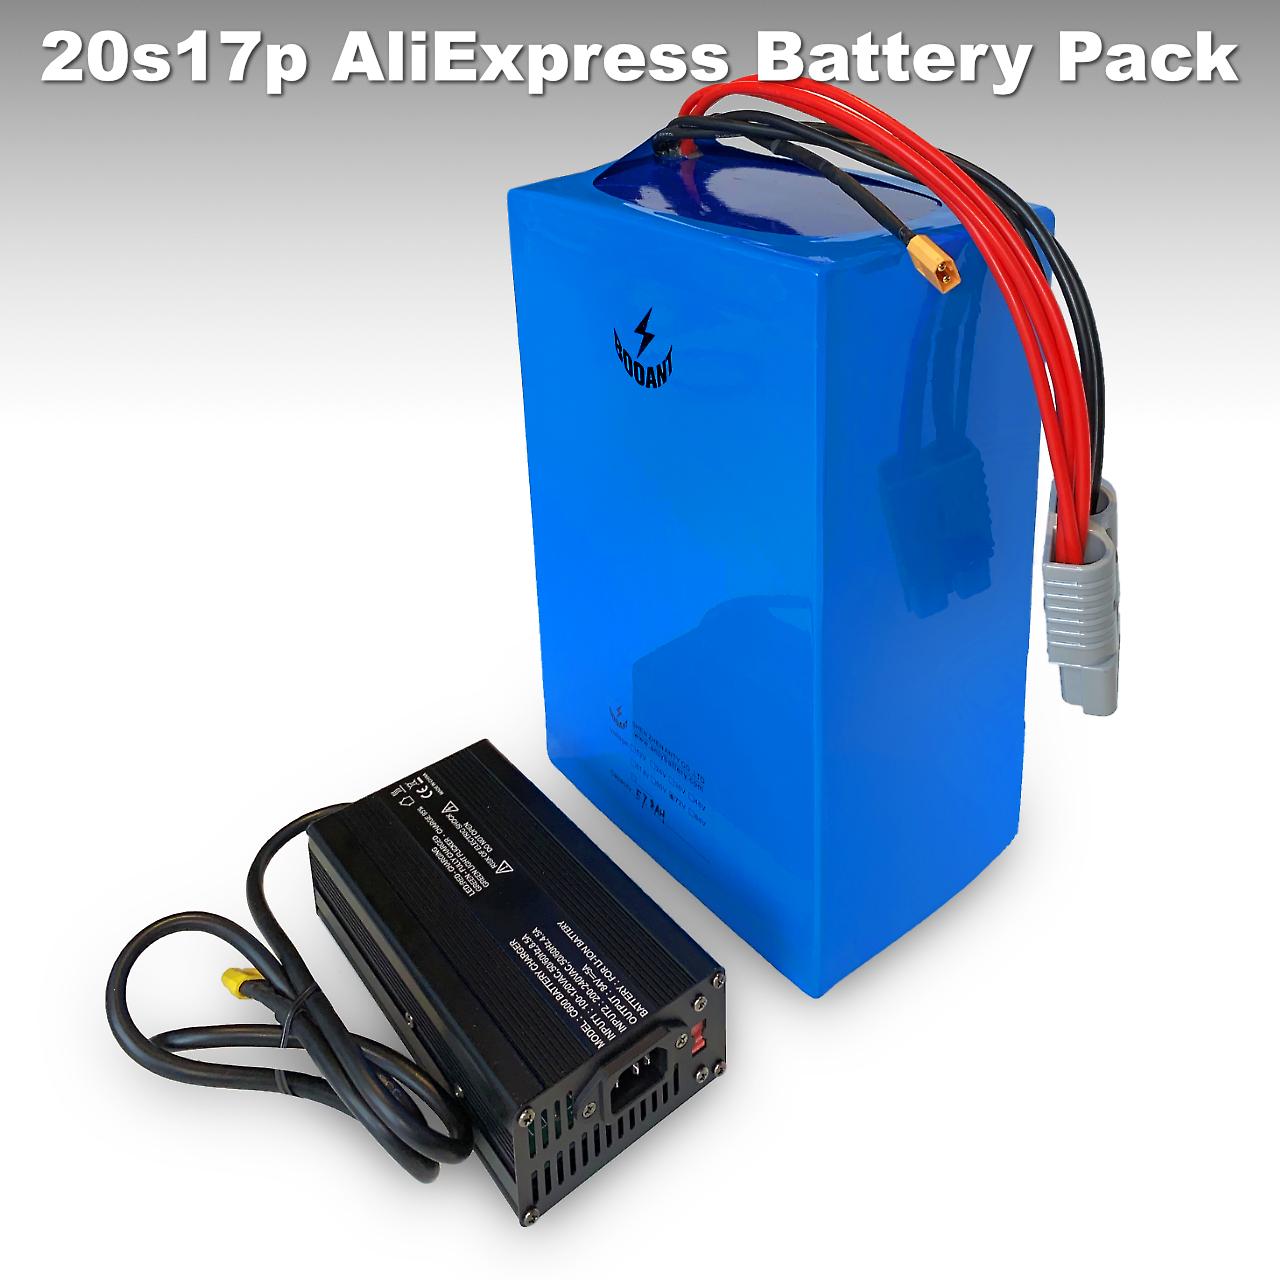 AliExpress battery IMG_6796.1280.jpg